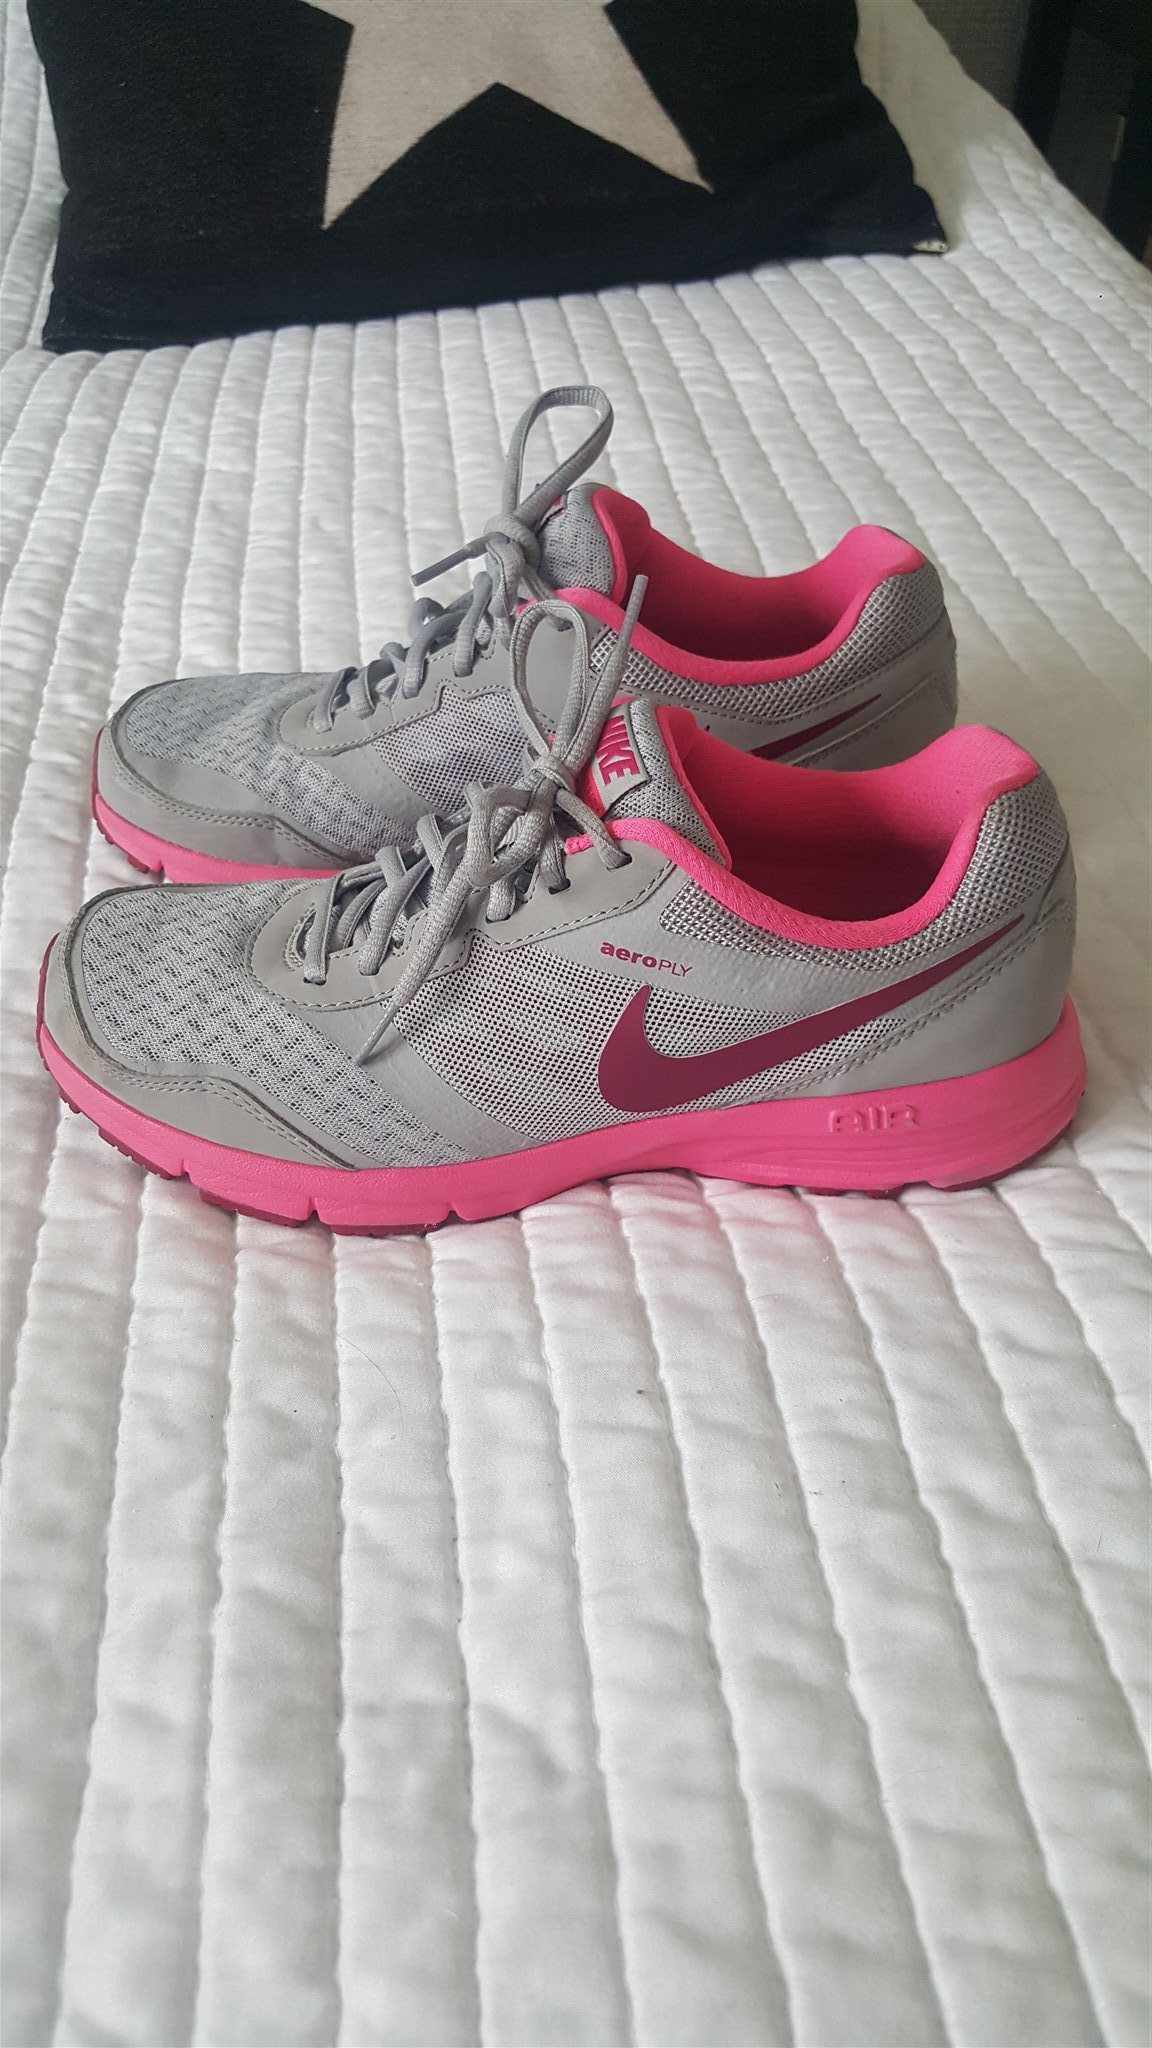 buy online 278b1 c4133 Nike Air Max Thea skor - Storlek 38,5 på Tradera.com - Sneakers,fina nike  skor